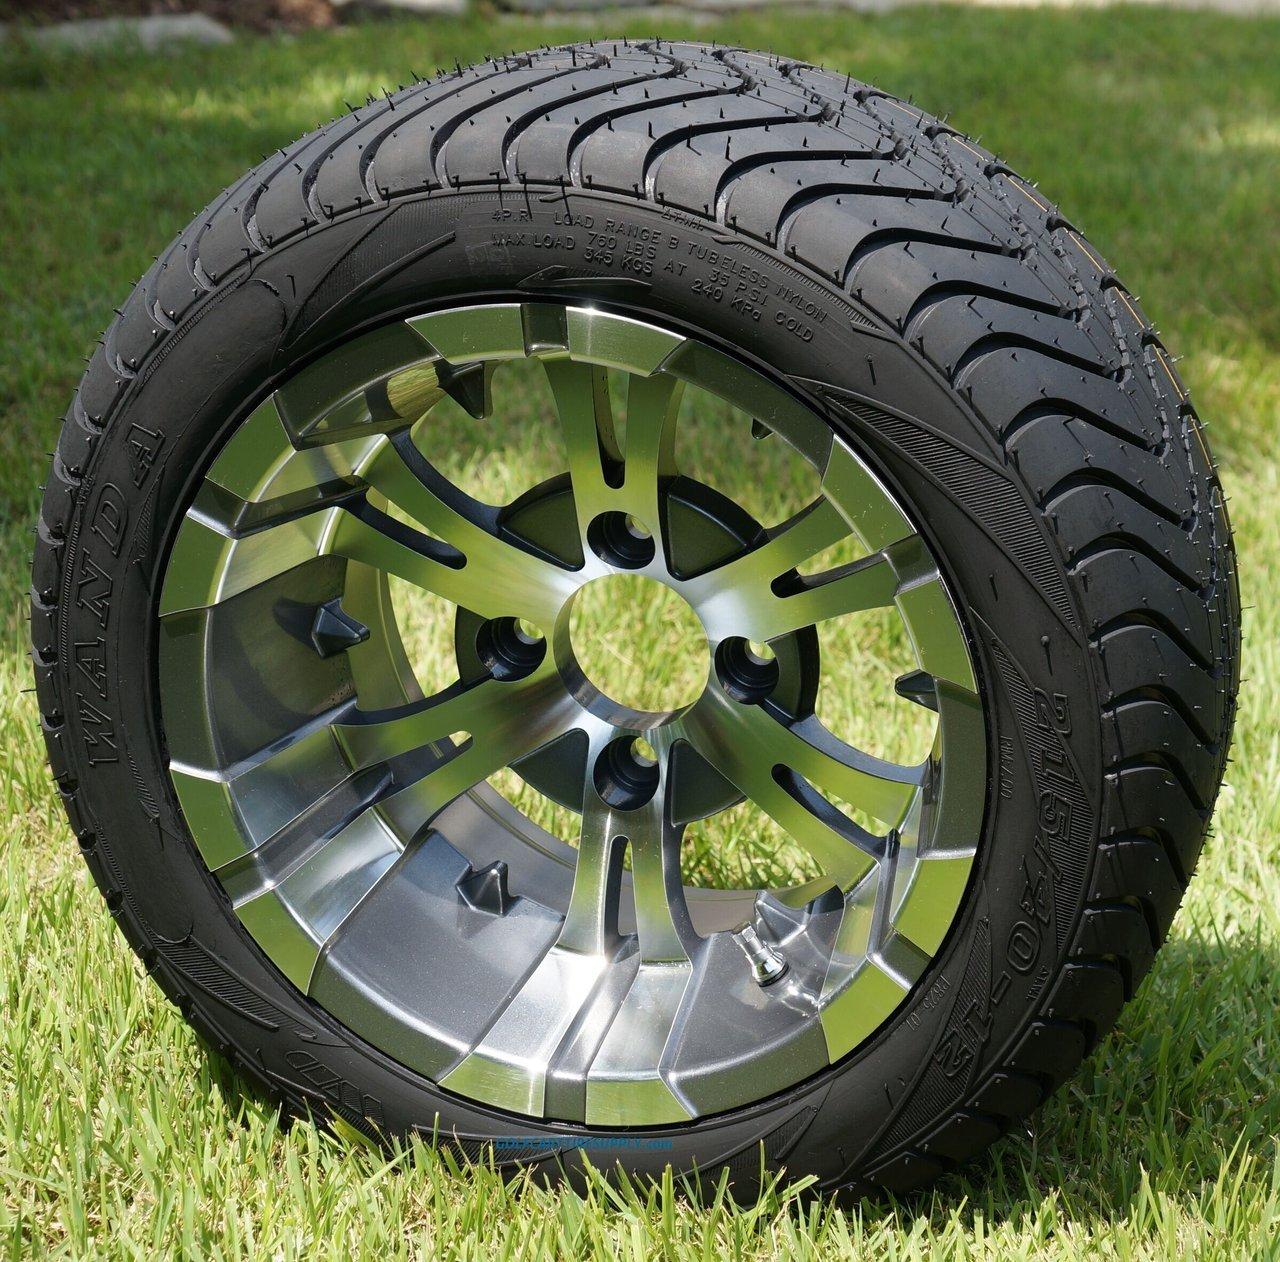 12'' Vampire Gunmetal Aluminum Wheels and 215/40-12 Low Profile DOT Golf Cart Tires Combo - Set of 4